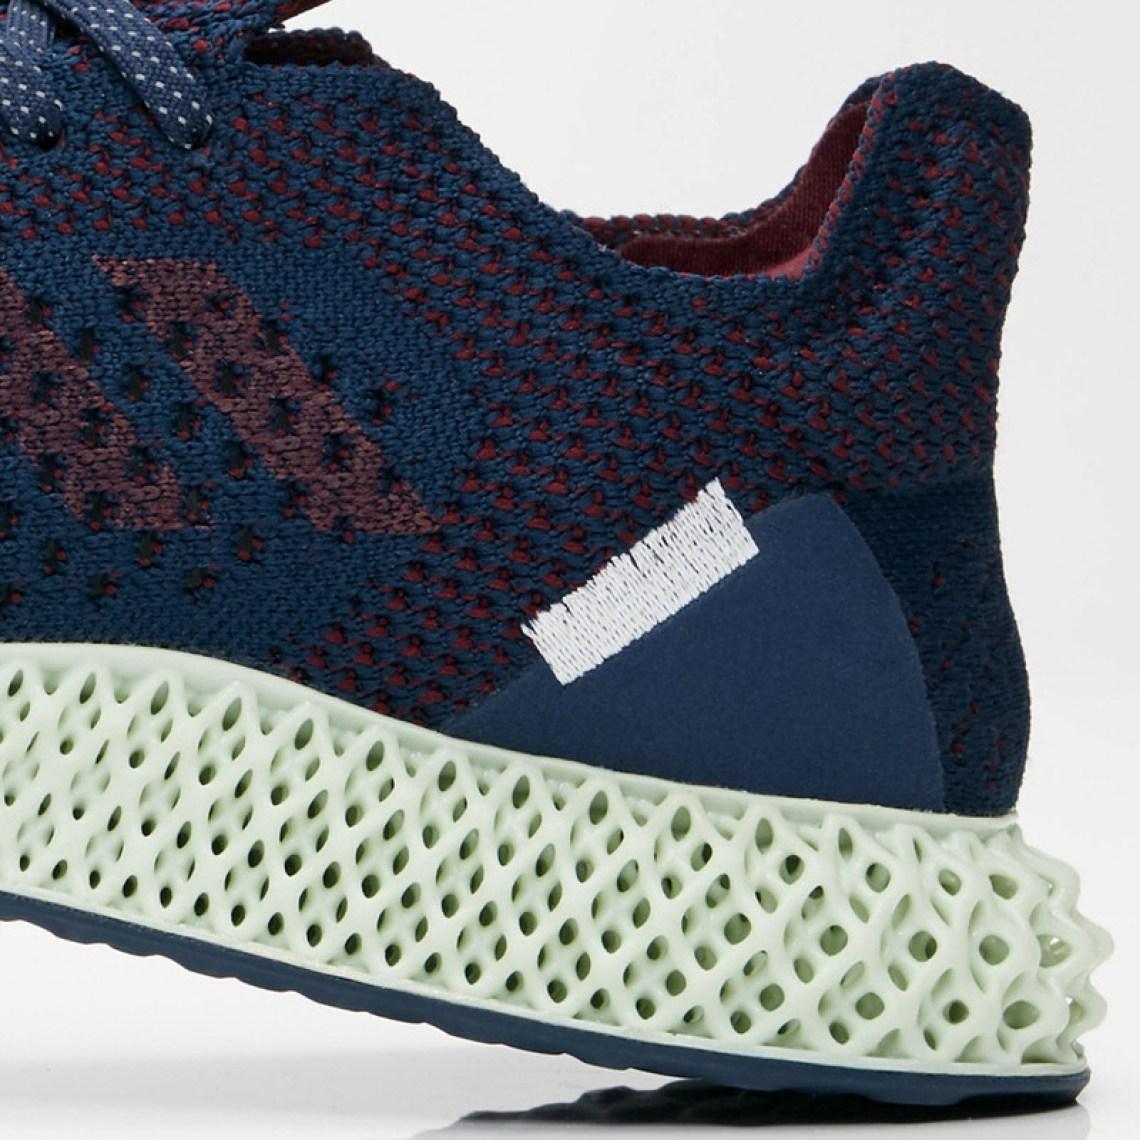 best sneakers cf300 0ec50 SNS x adidas Consortium 4D SNS x adidas Consortium 4D